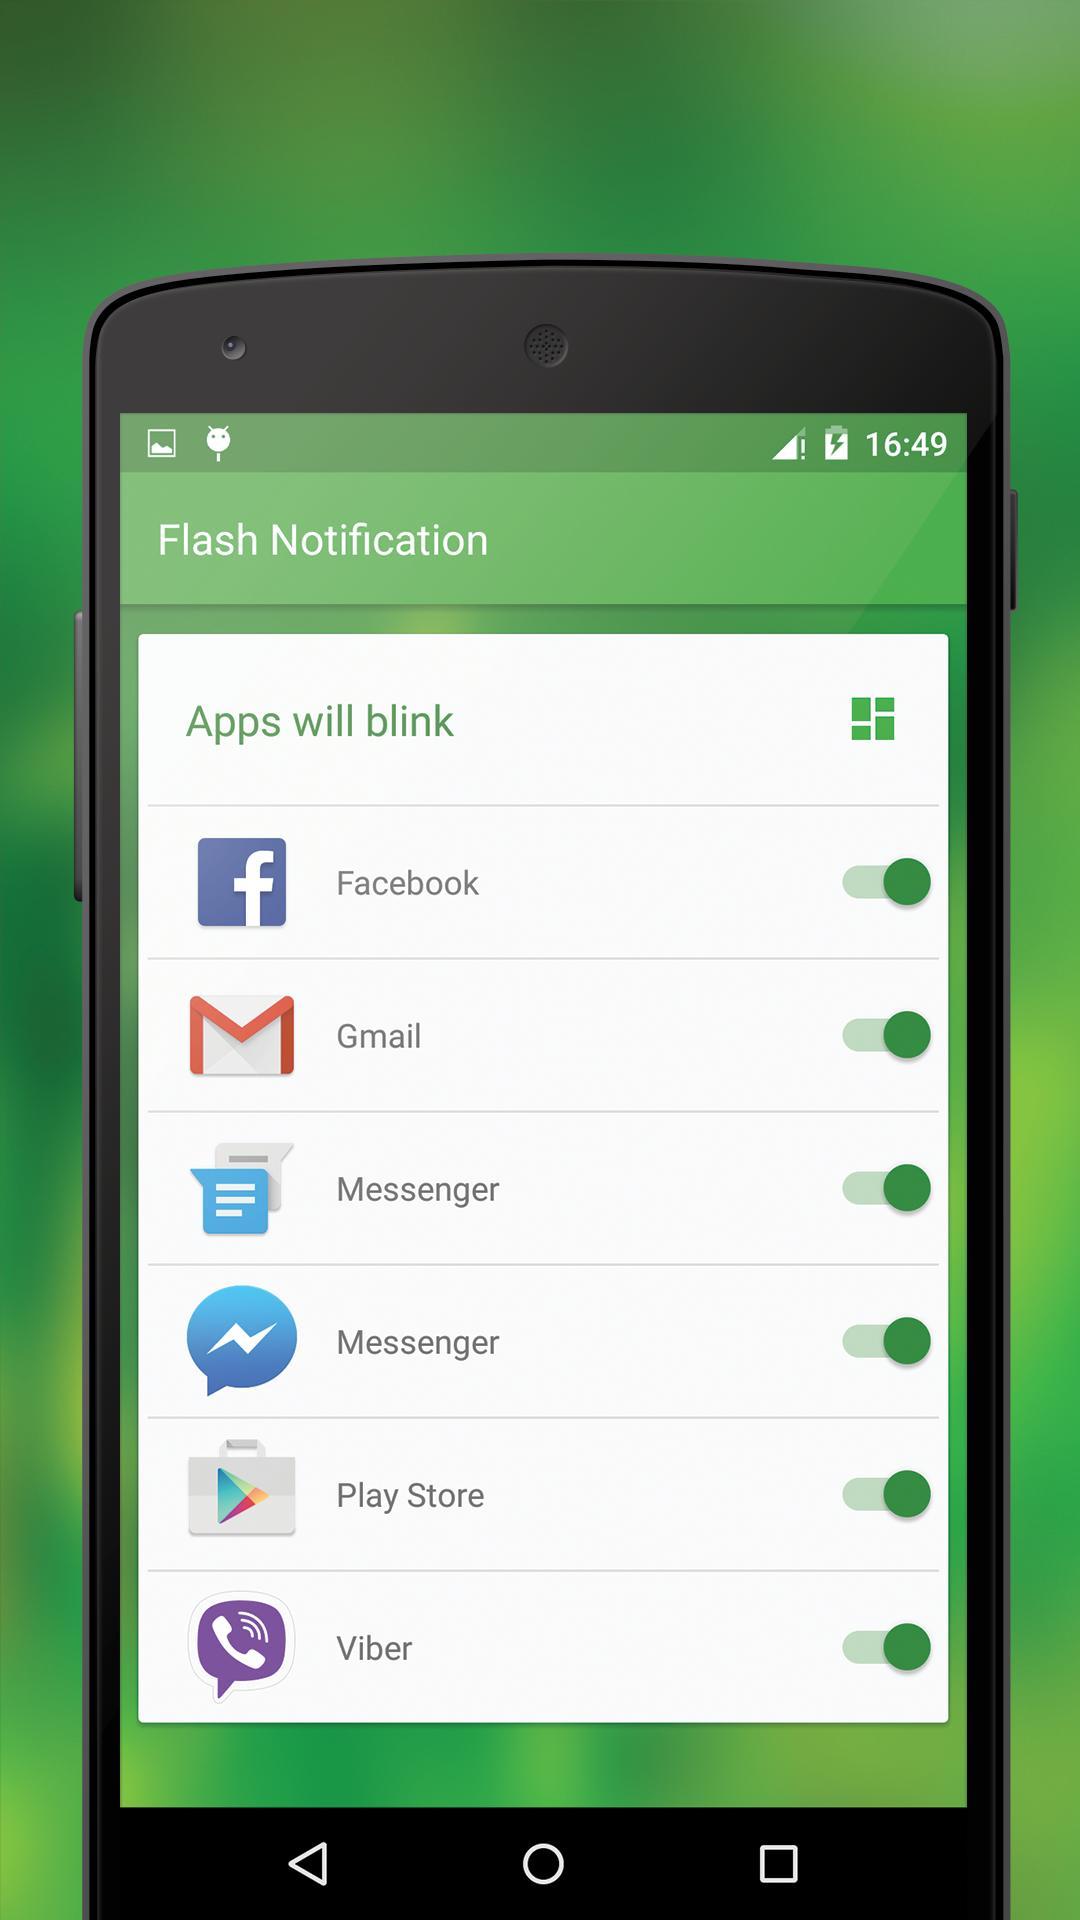 flash notification 2 apk download